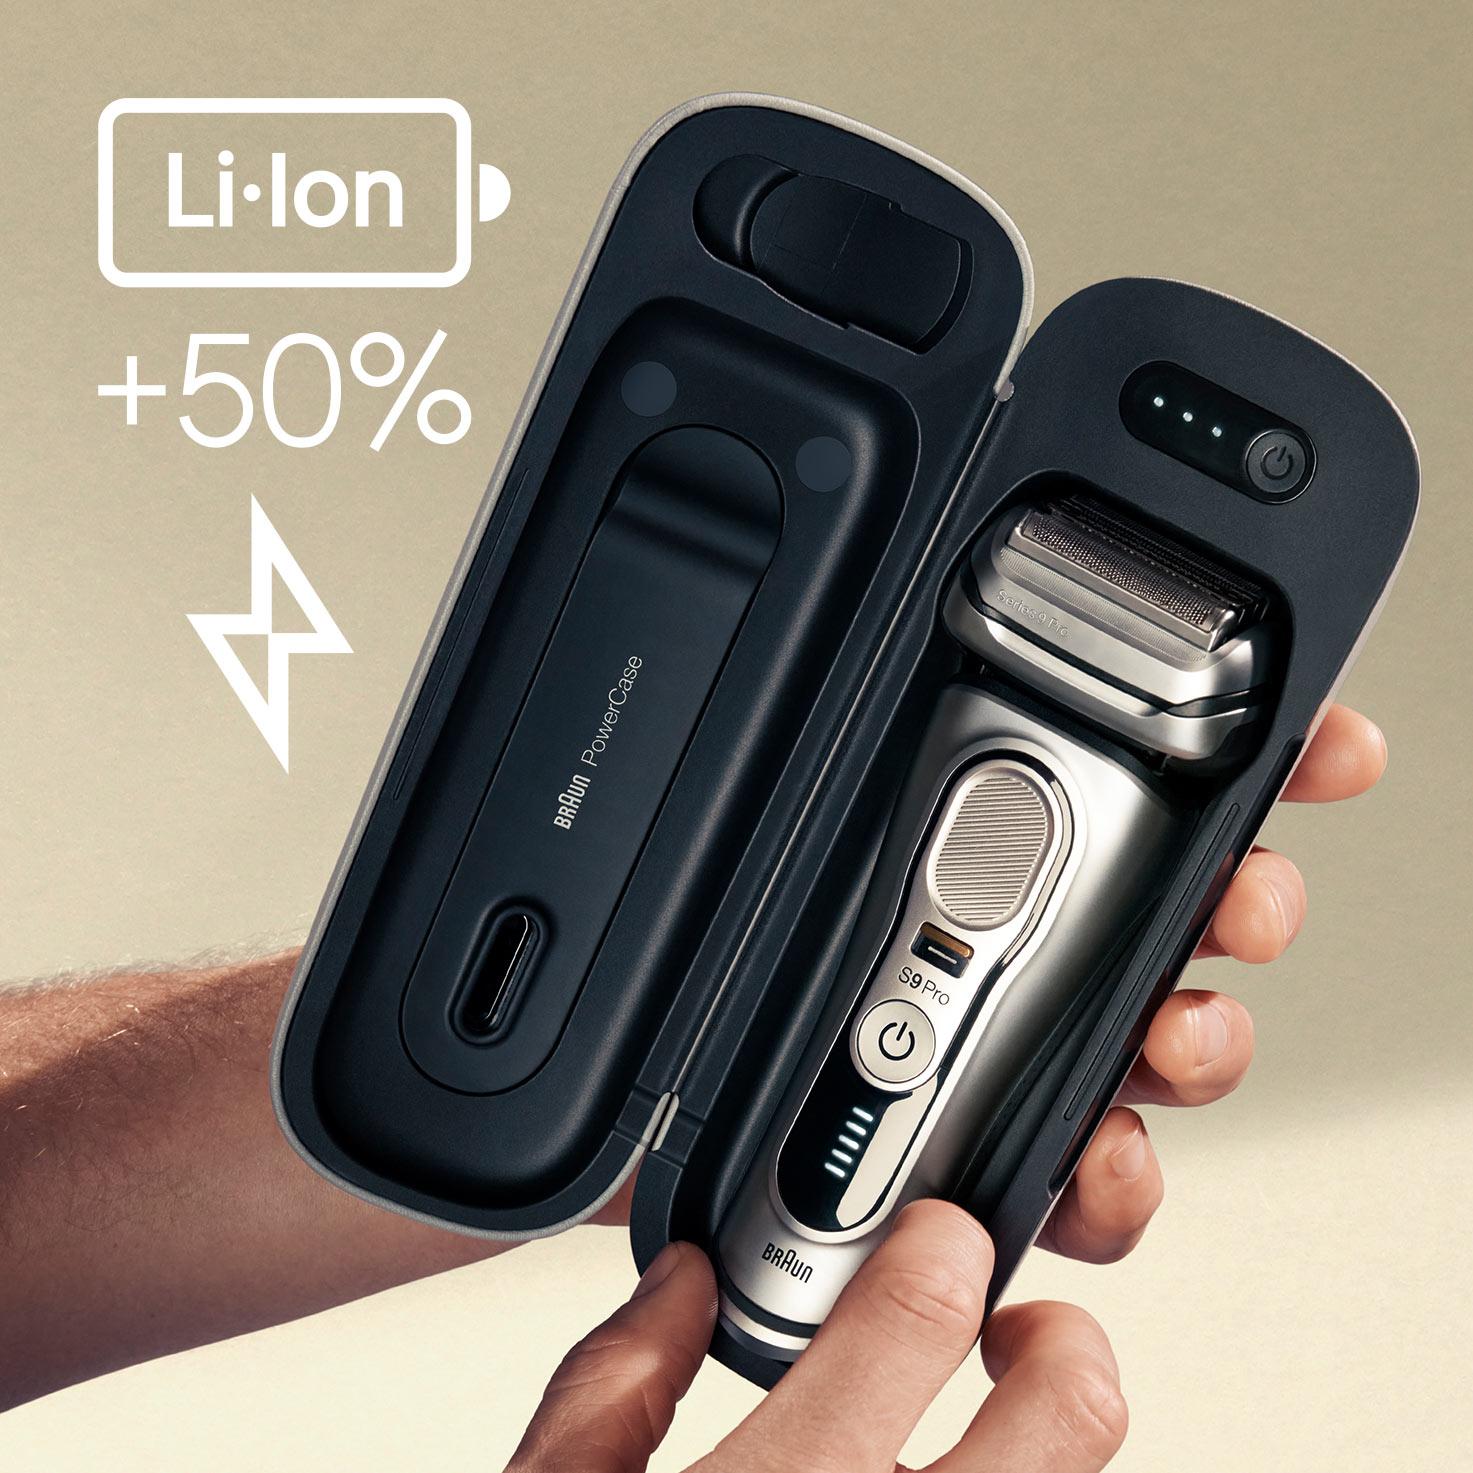 O 50% delší doba provozu na baterie